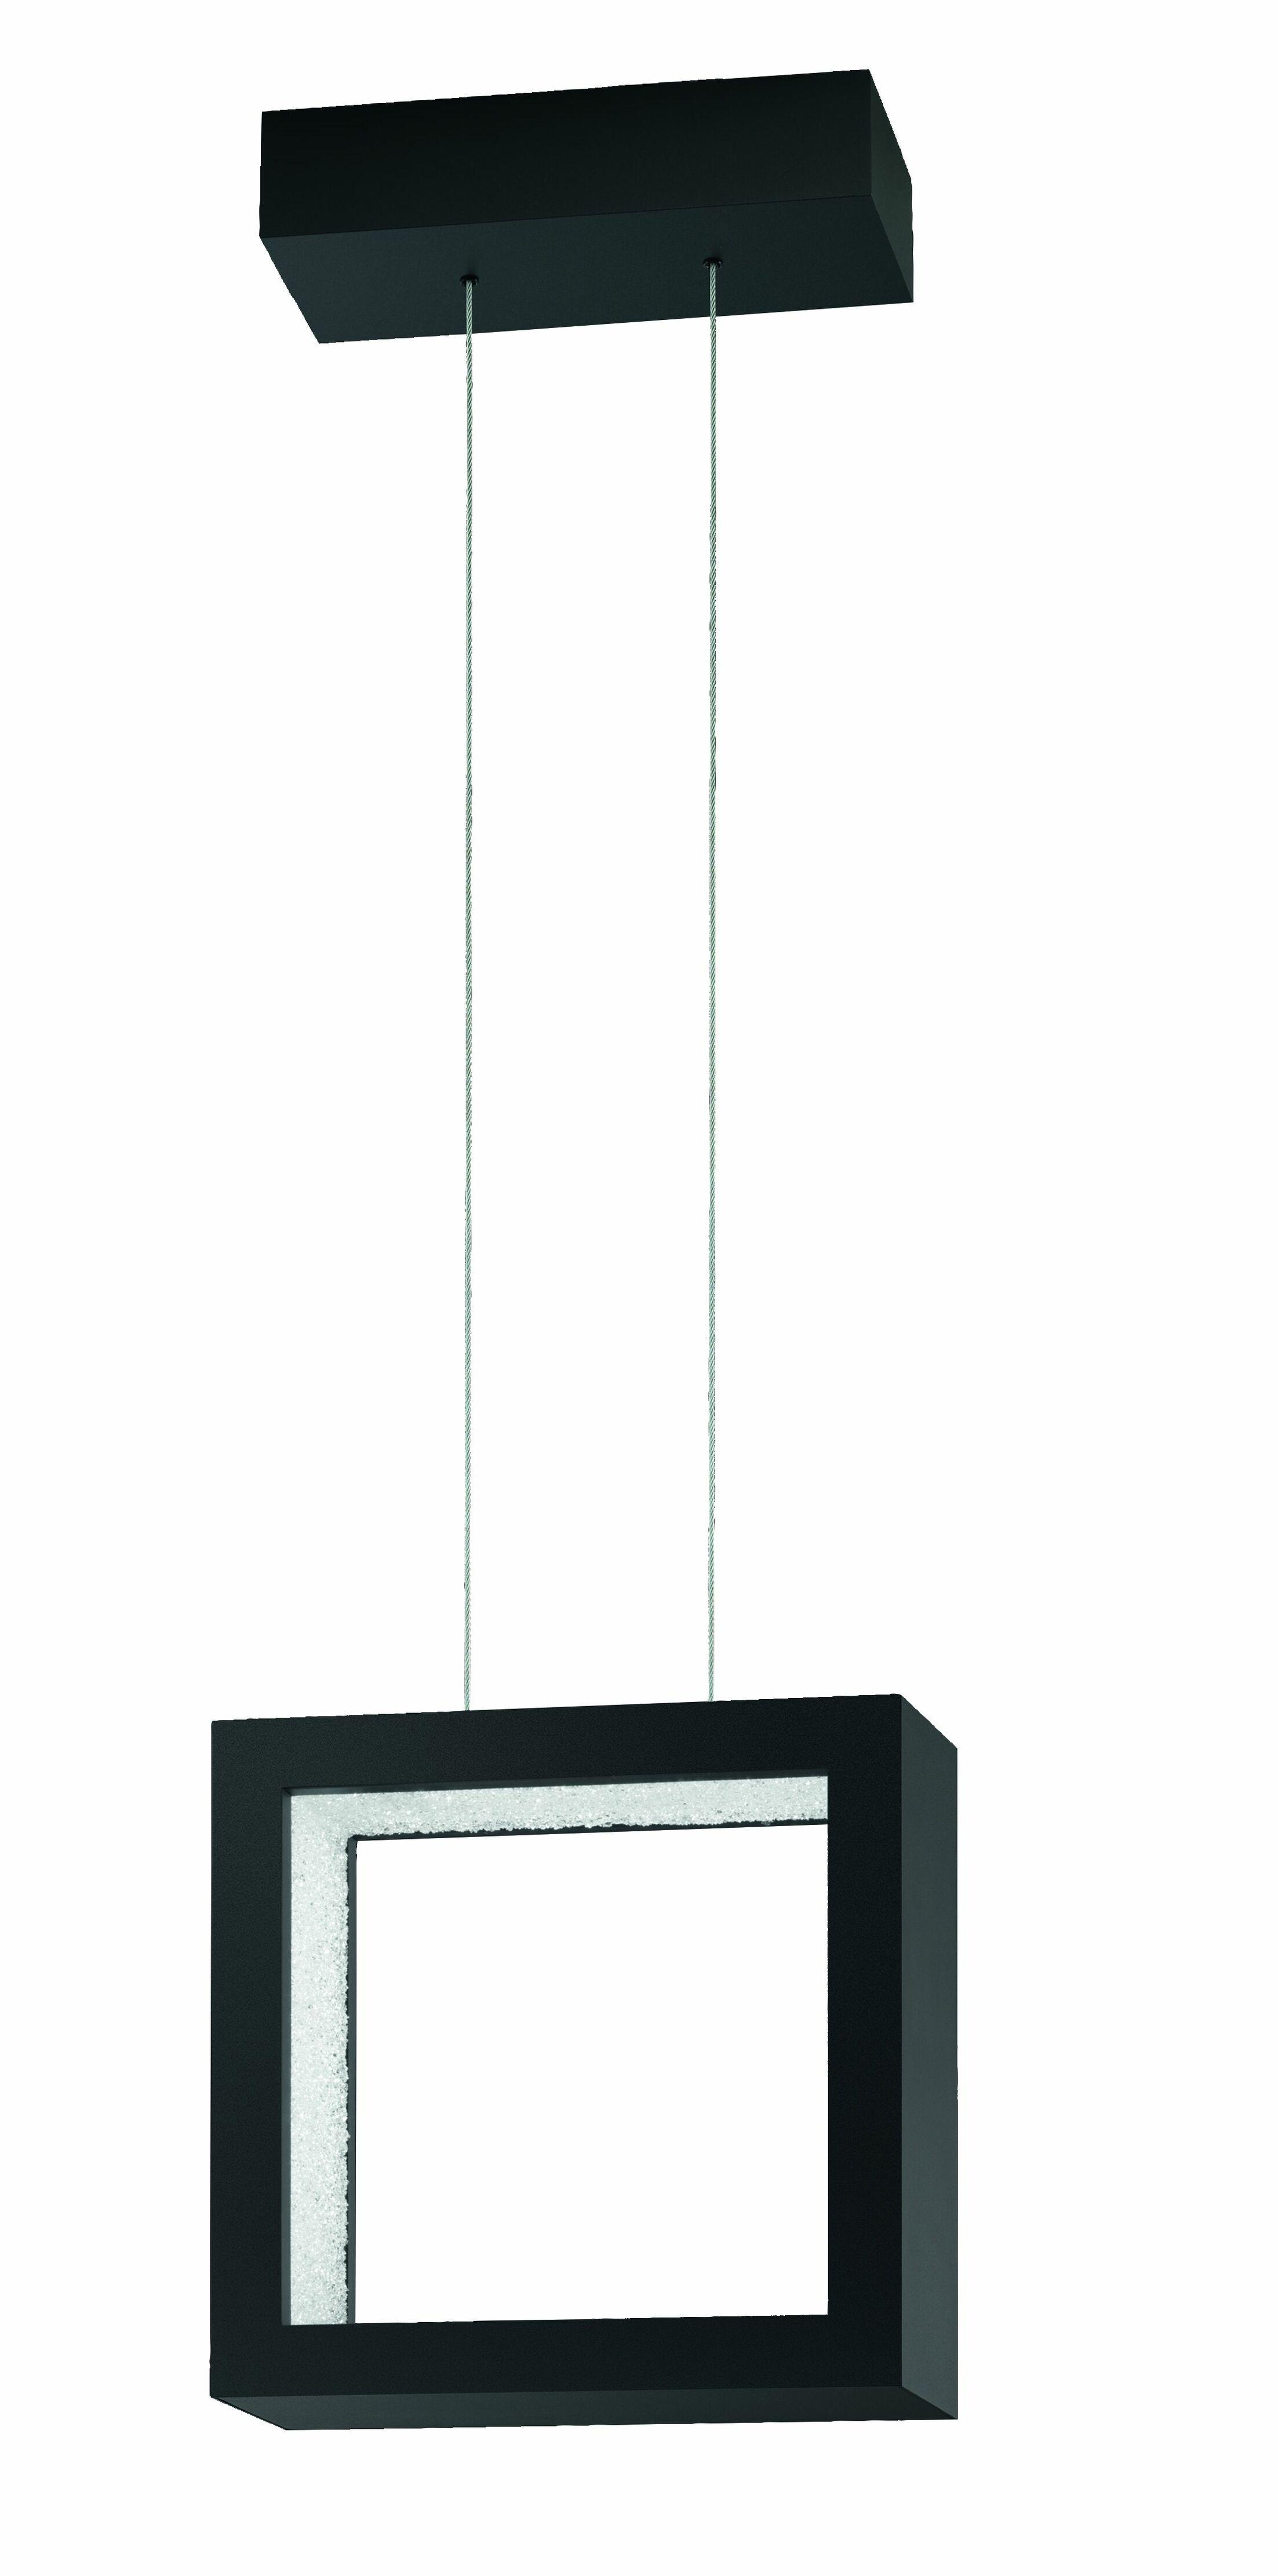 ReveaLED Open 8-Light LED Kitchen Island Pendant Base Finish: Earth Black, Color Temperature: 4000K